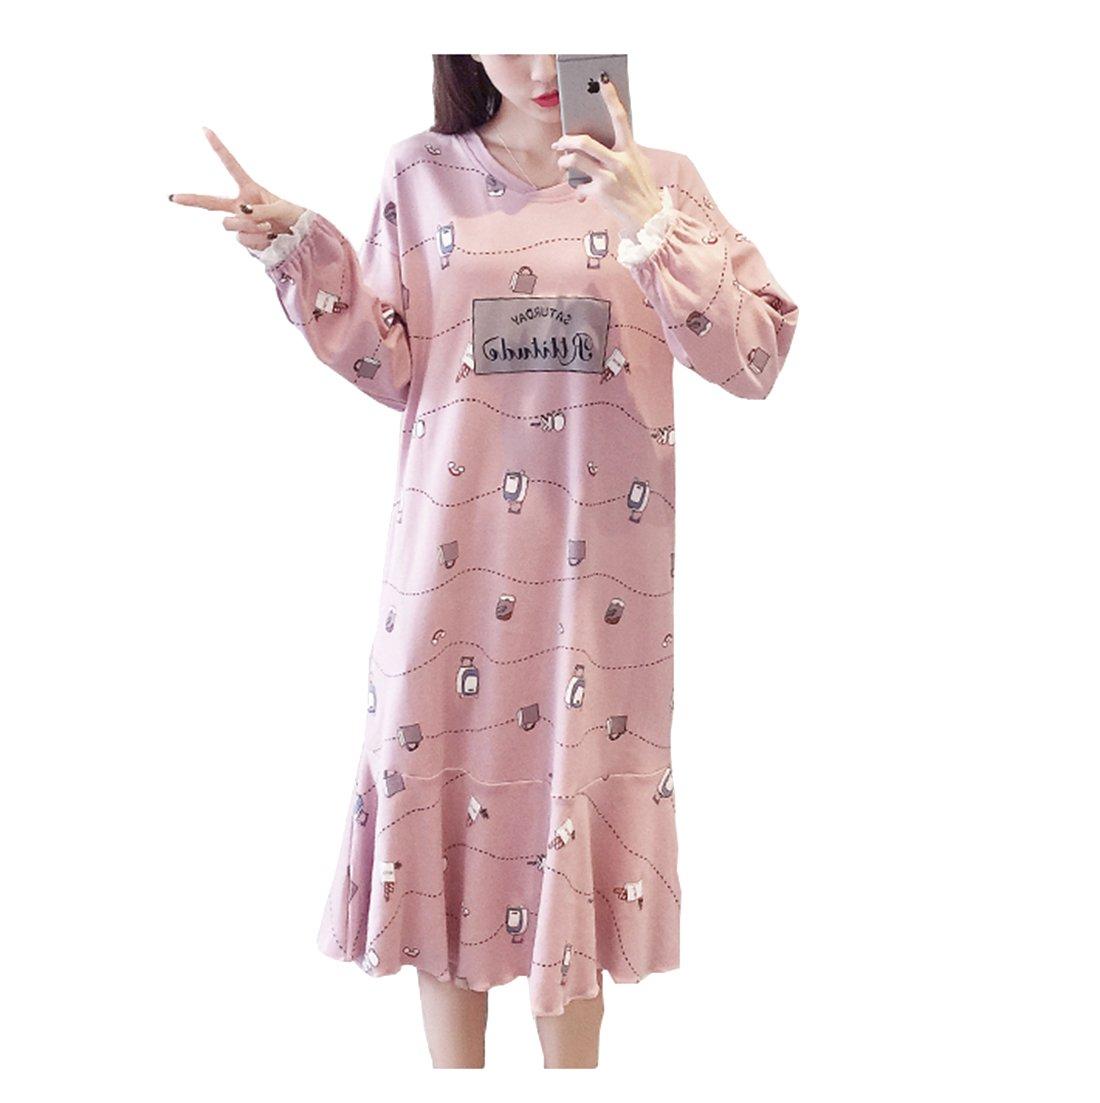 Respeedime SLEEPWEAR レディース B075ZVFWBJ L|ピンク ピンク L